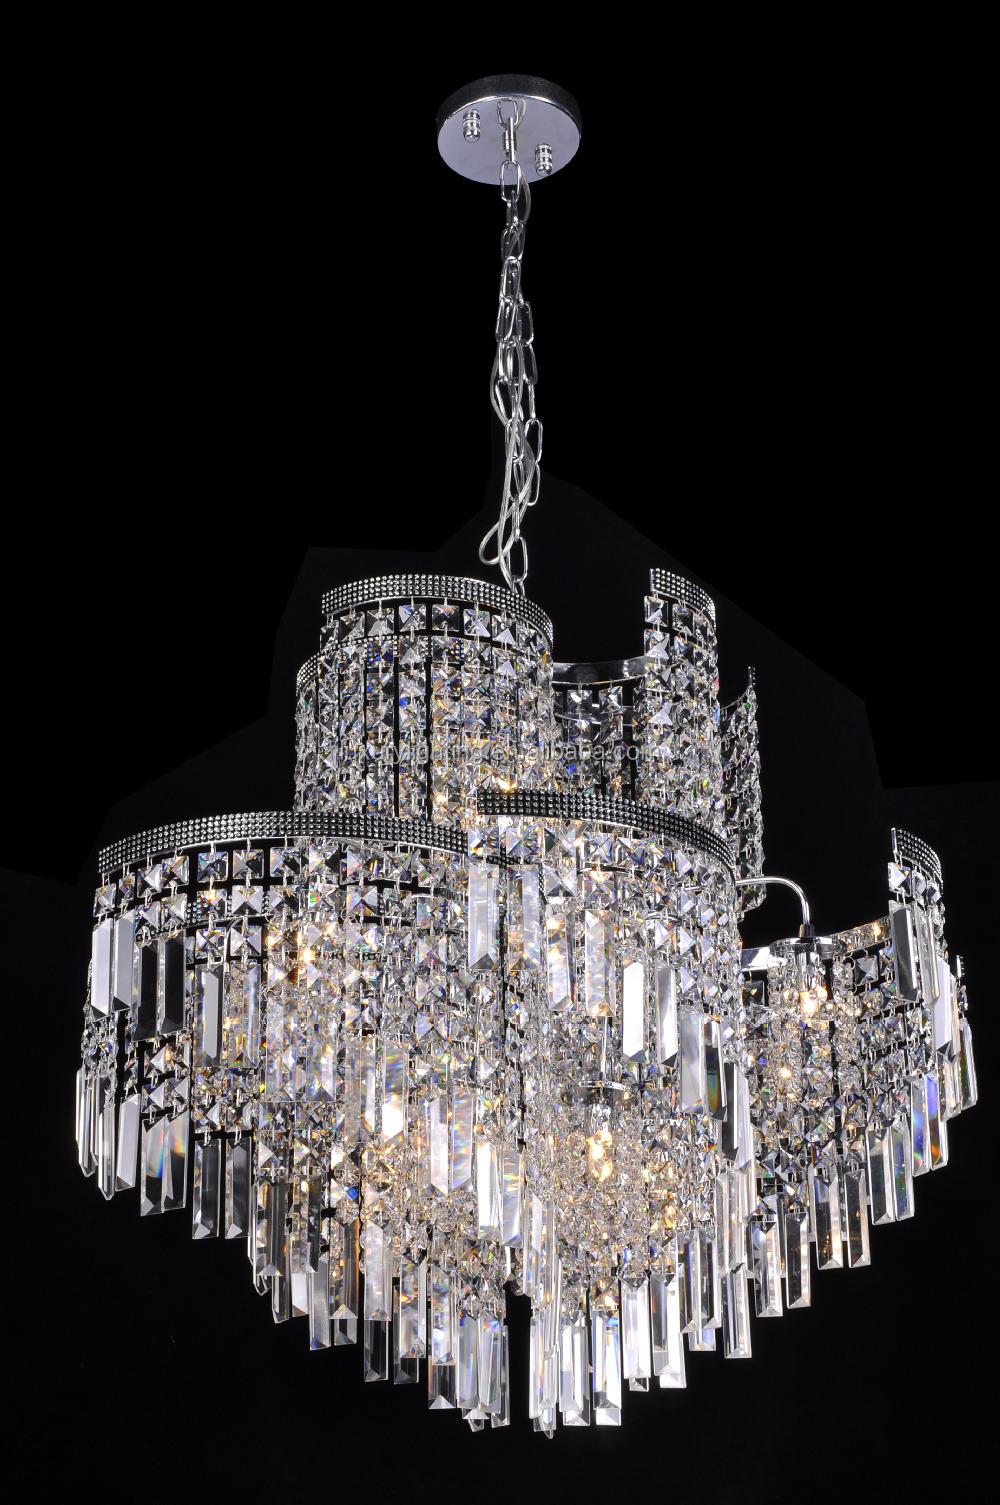 Luxury crystal hanging chandelier pendant lamps